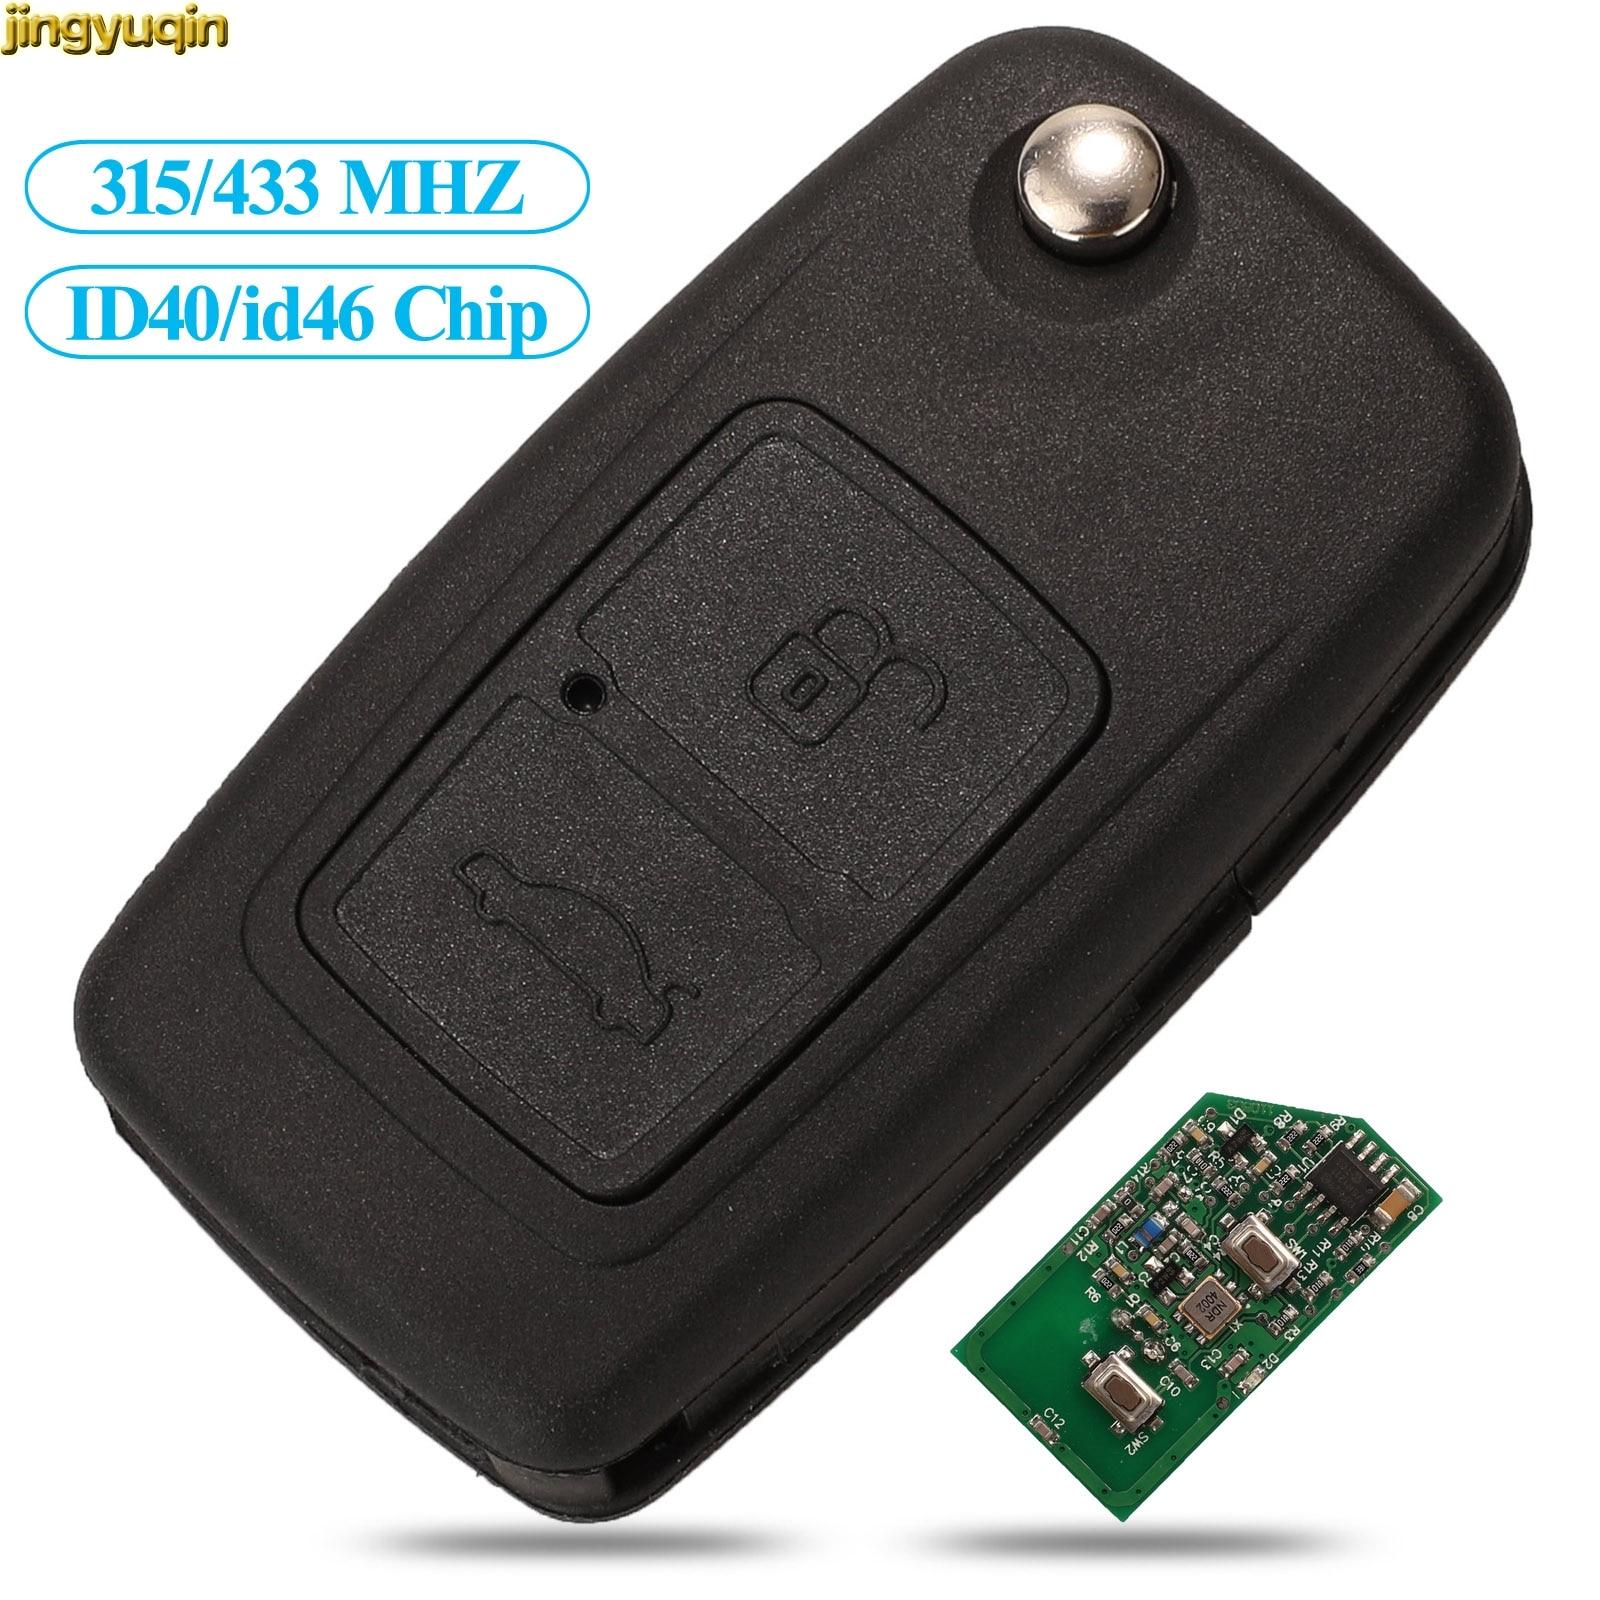 Jingyuqin controle remoto chave do carro 315/433 mhz id40/id46 chip para chery a5 a3 antes de 2009 2 botão 9cn a21 lâmina